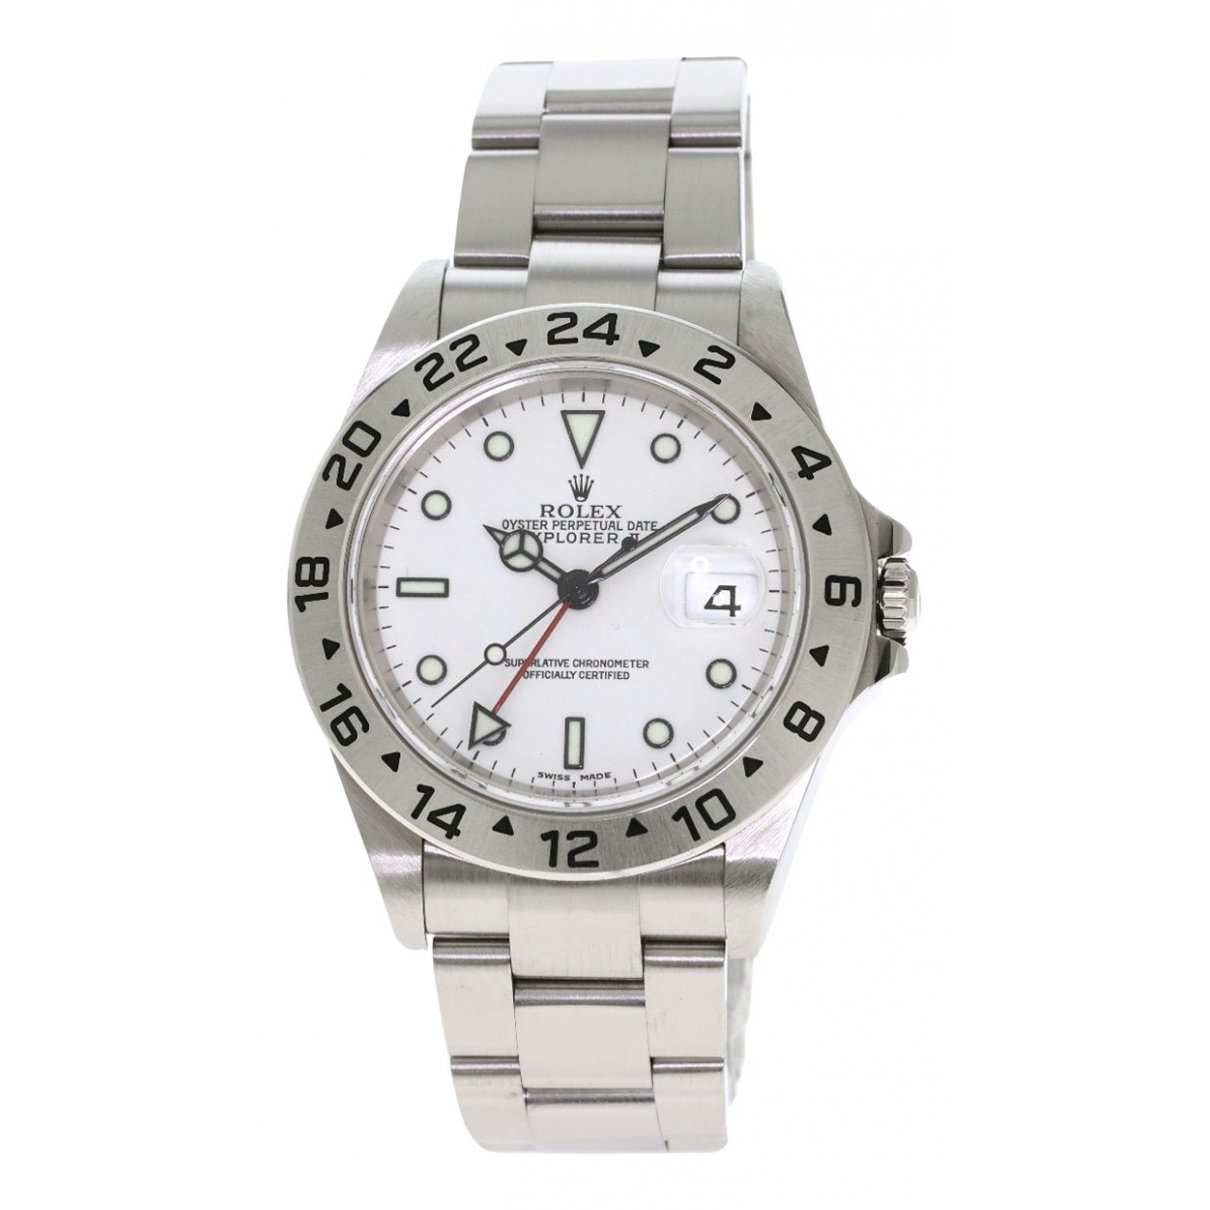 Rolex Explorer 39mm Silver Steel Watch for Men